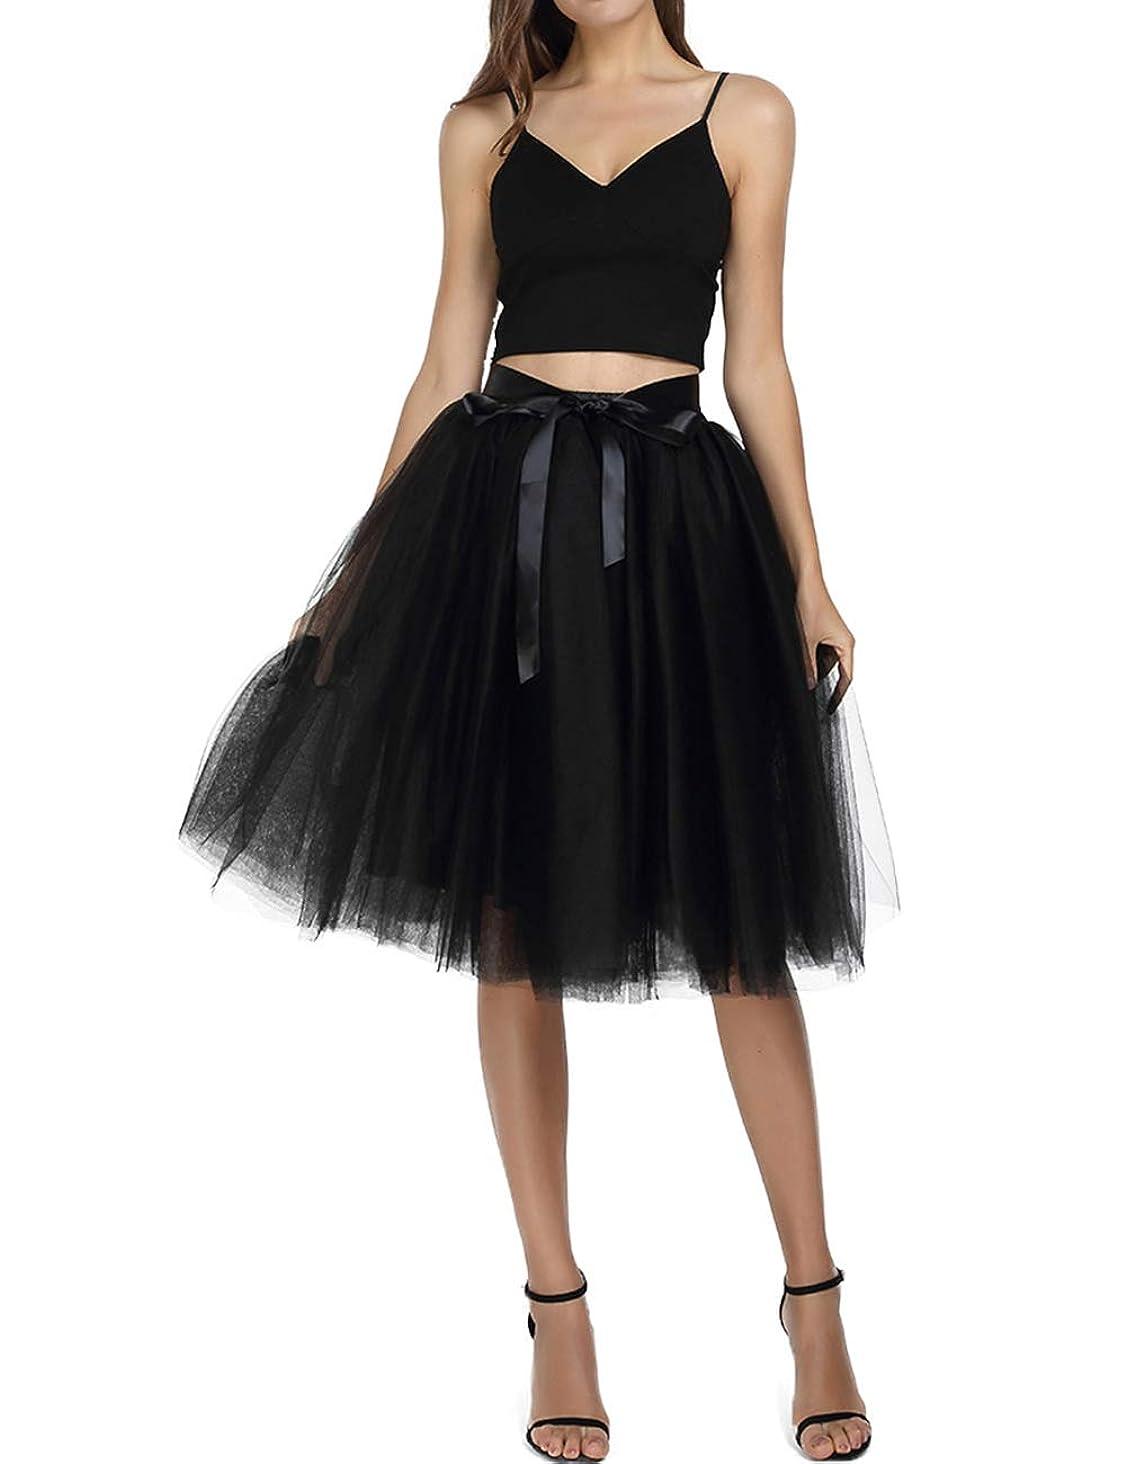 Minyue Women's Tulle Skirt A Line Midi/Knee Length Tutu 6 Layered Pleated Dance Skirt